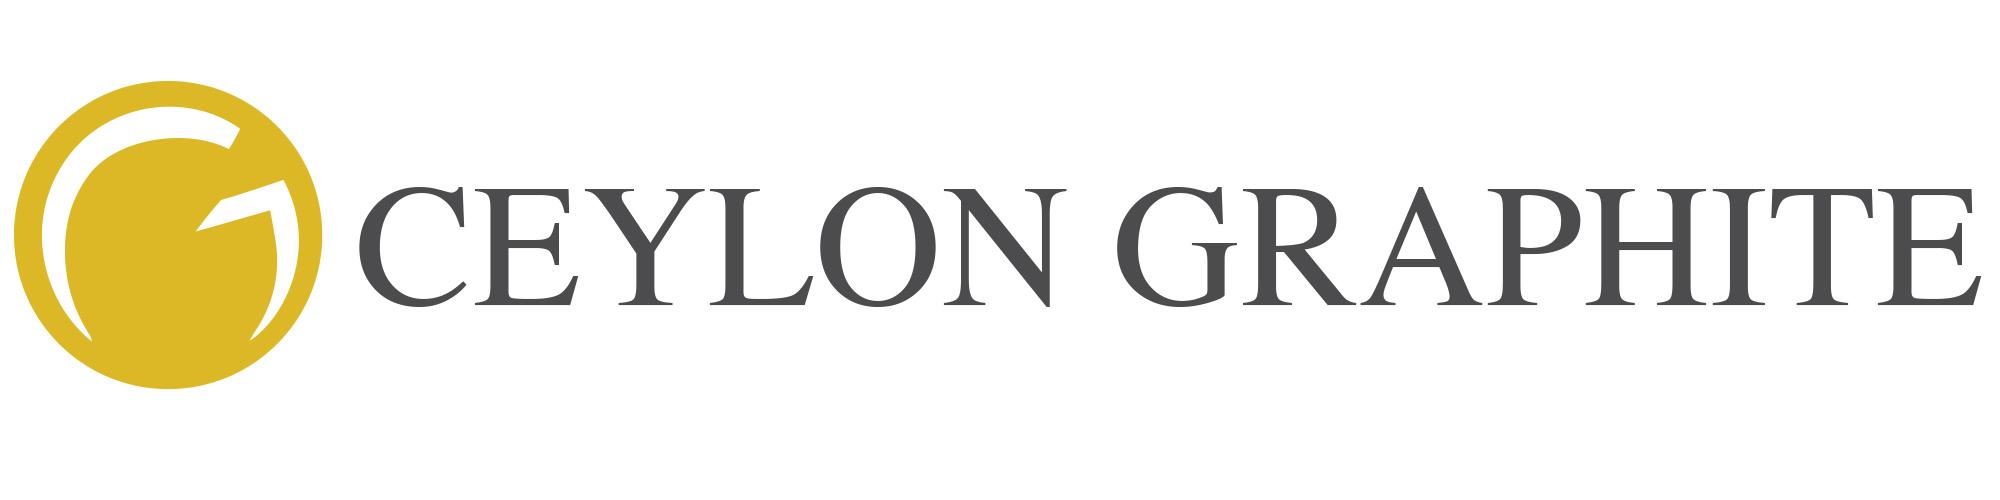 Ceylon Updates Private Placement